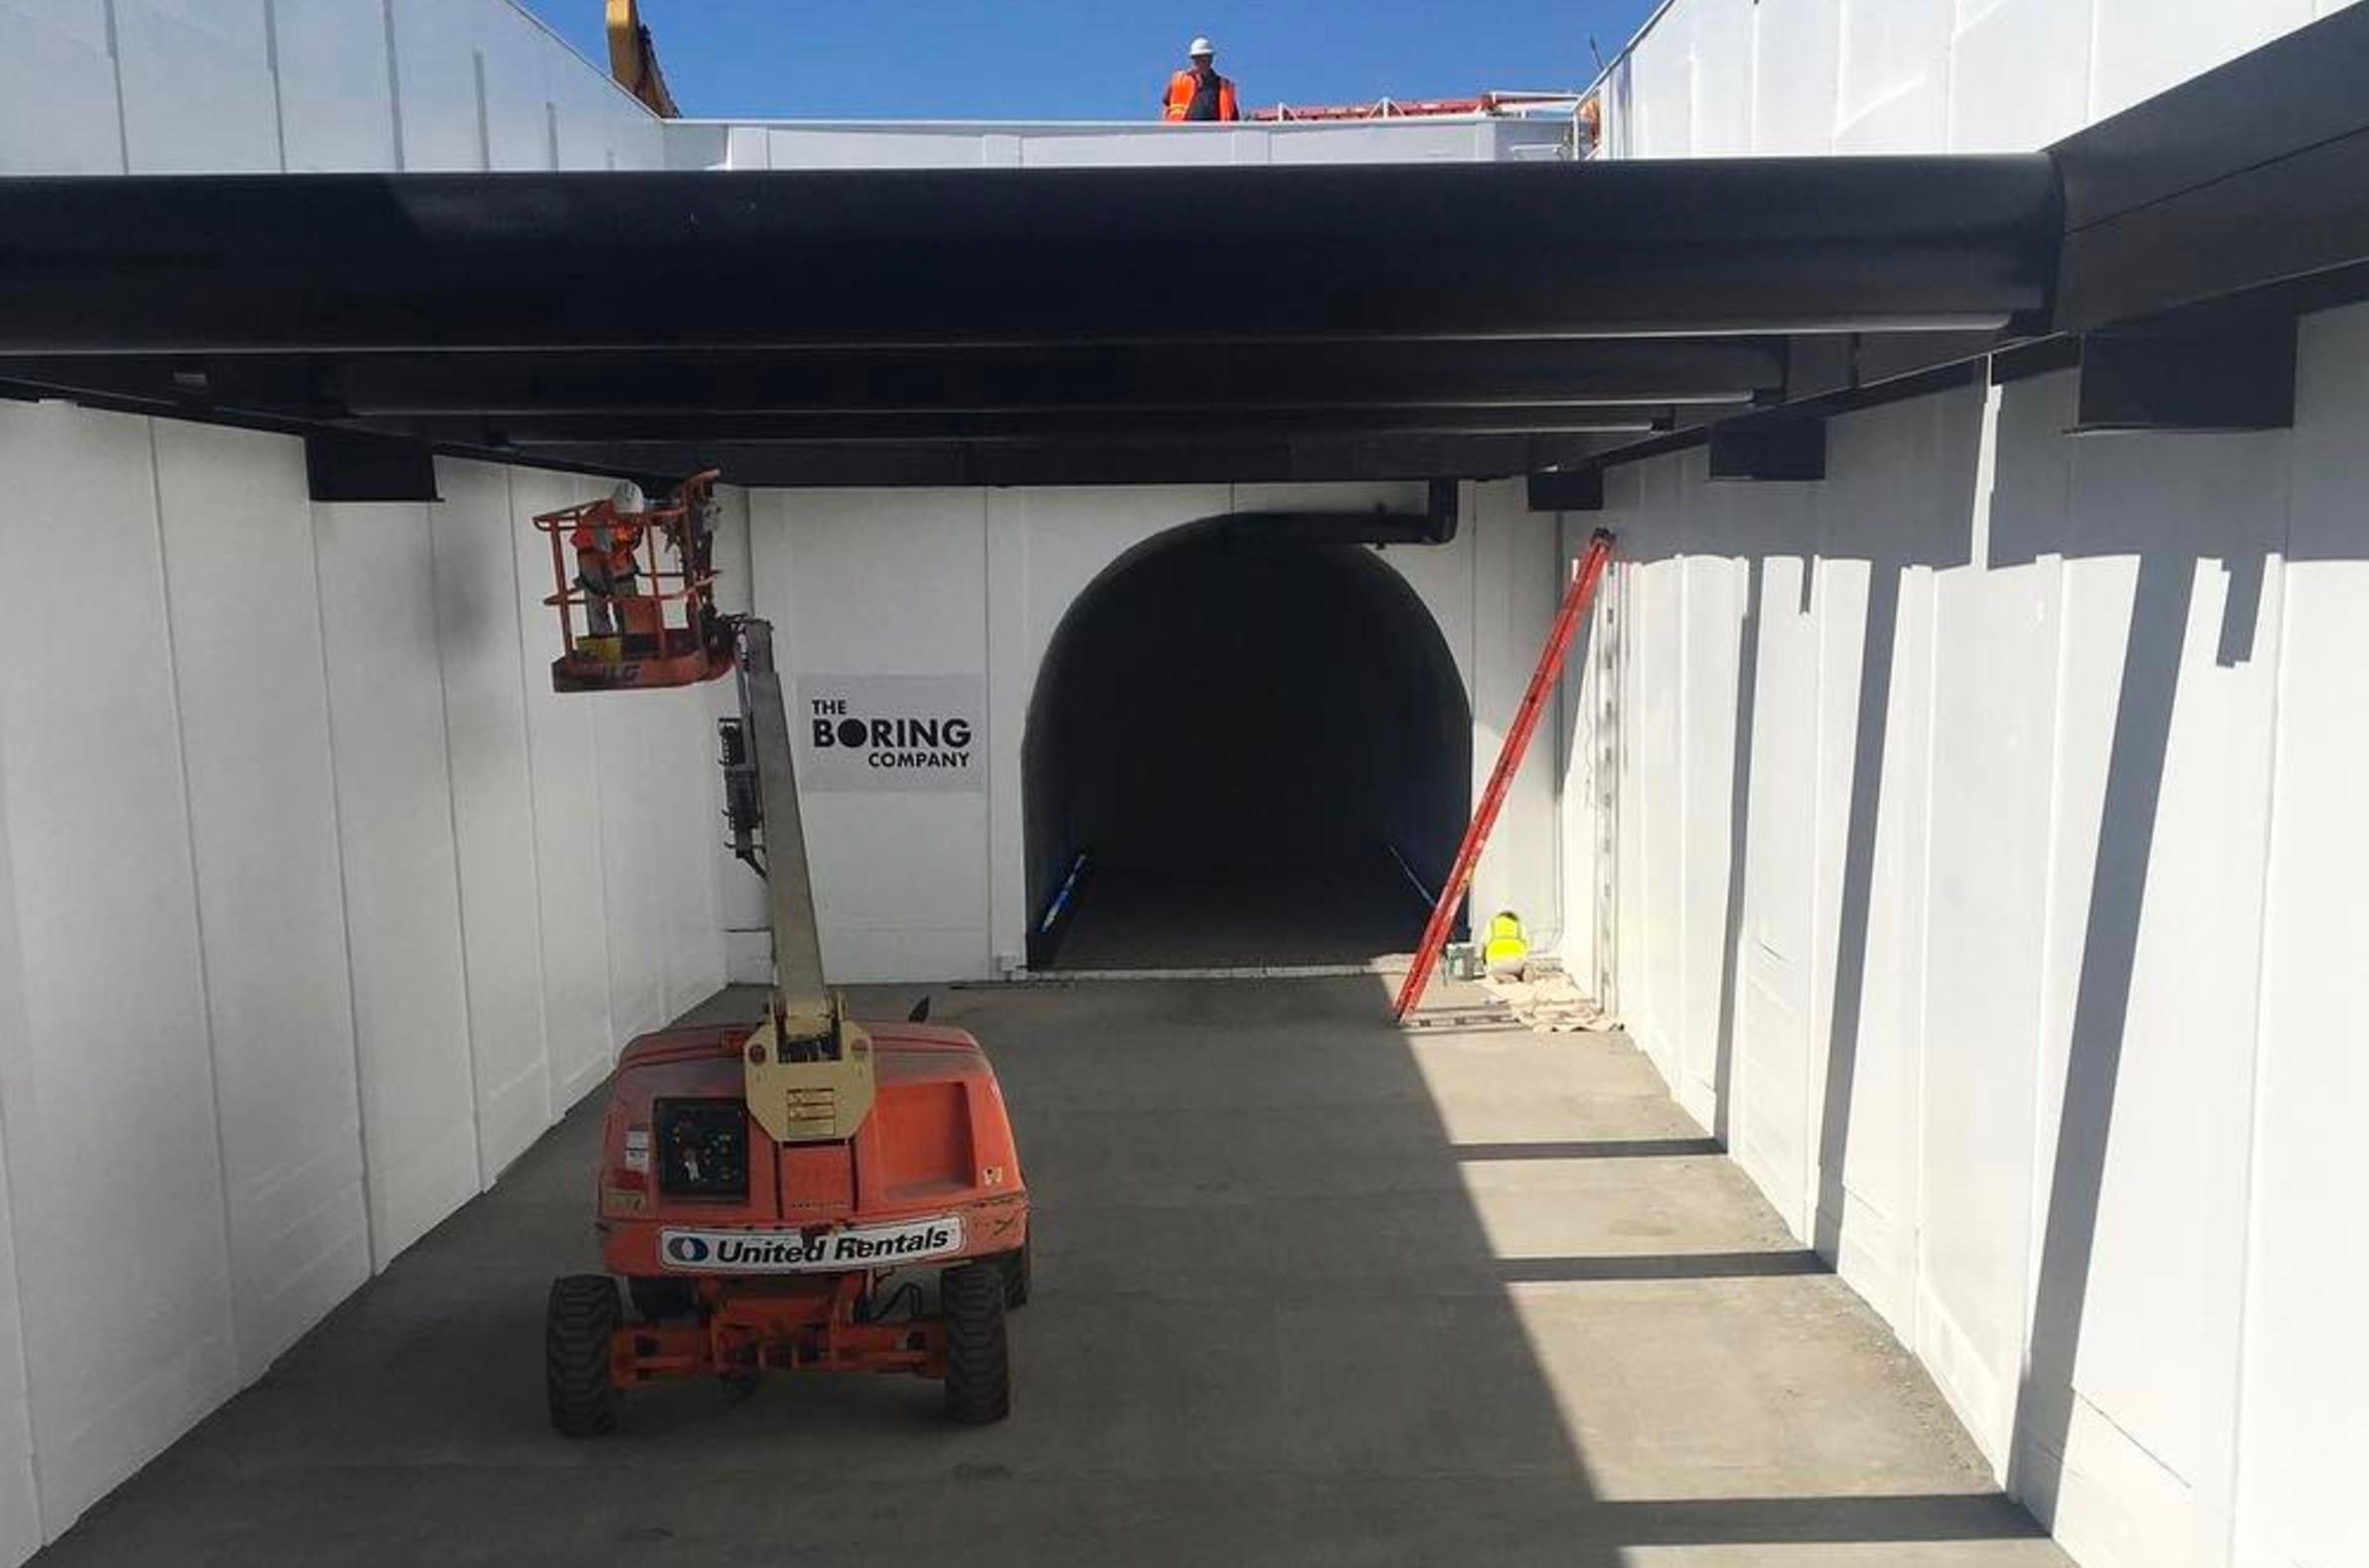 elon-musk-boring-company-tunnel-entry